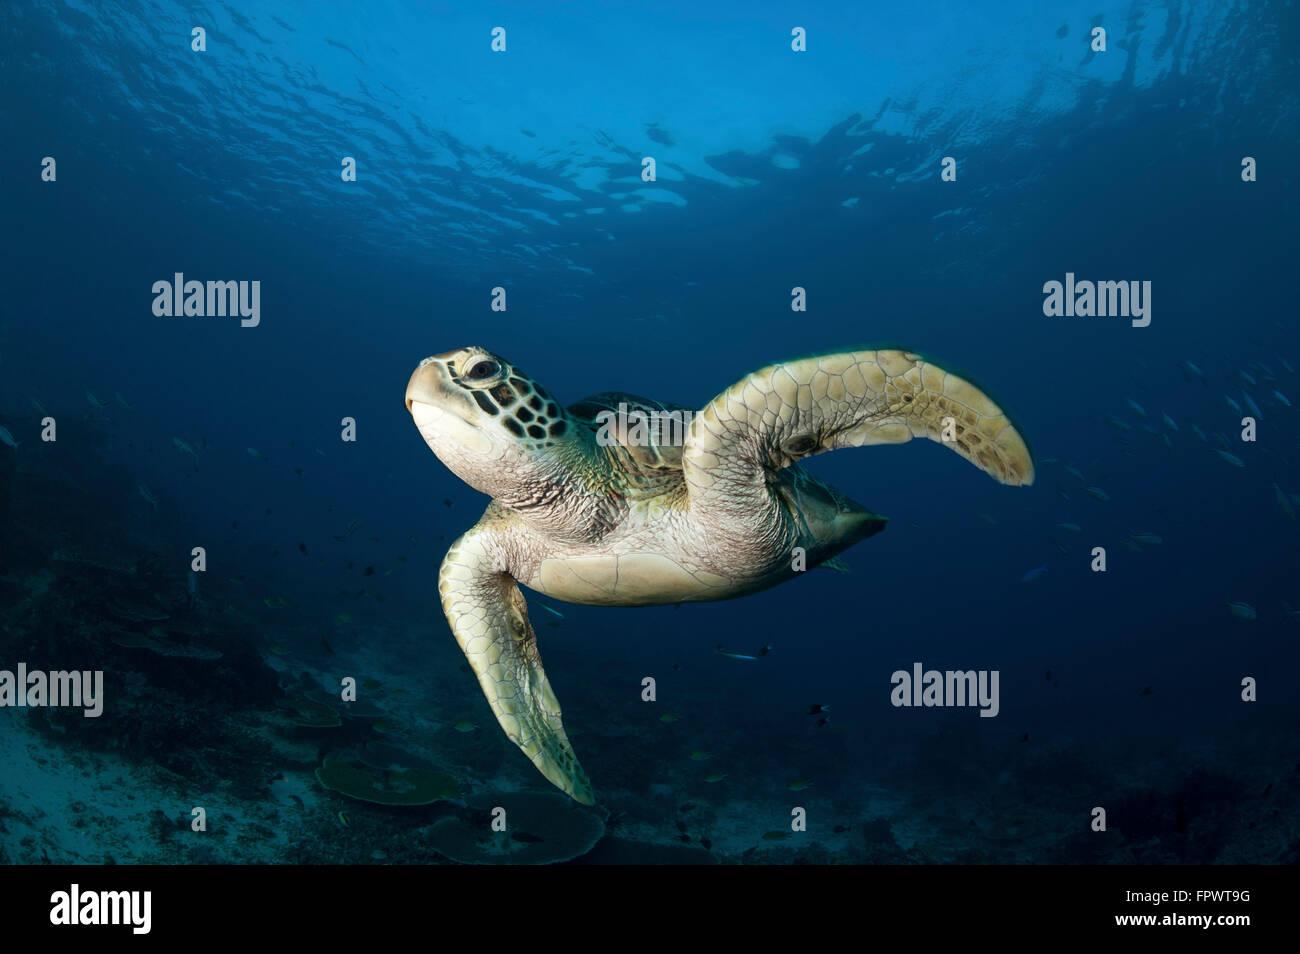 Une tortue verte (Chelonia mydas) baignade dans le Parc National de Komodo, en Indonésie. Photo Stock